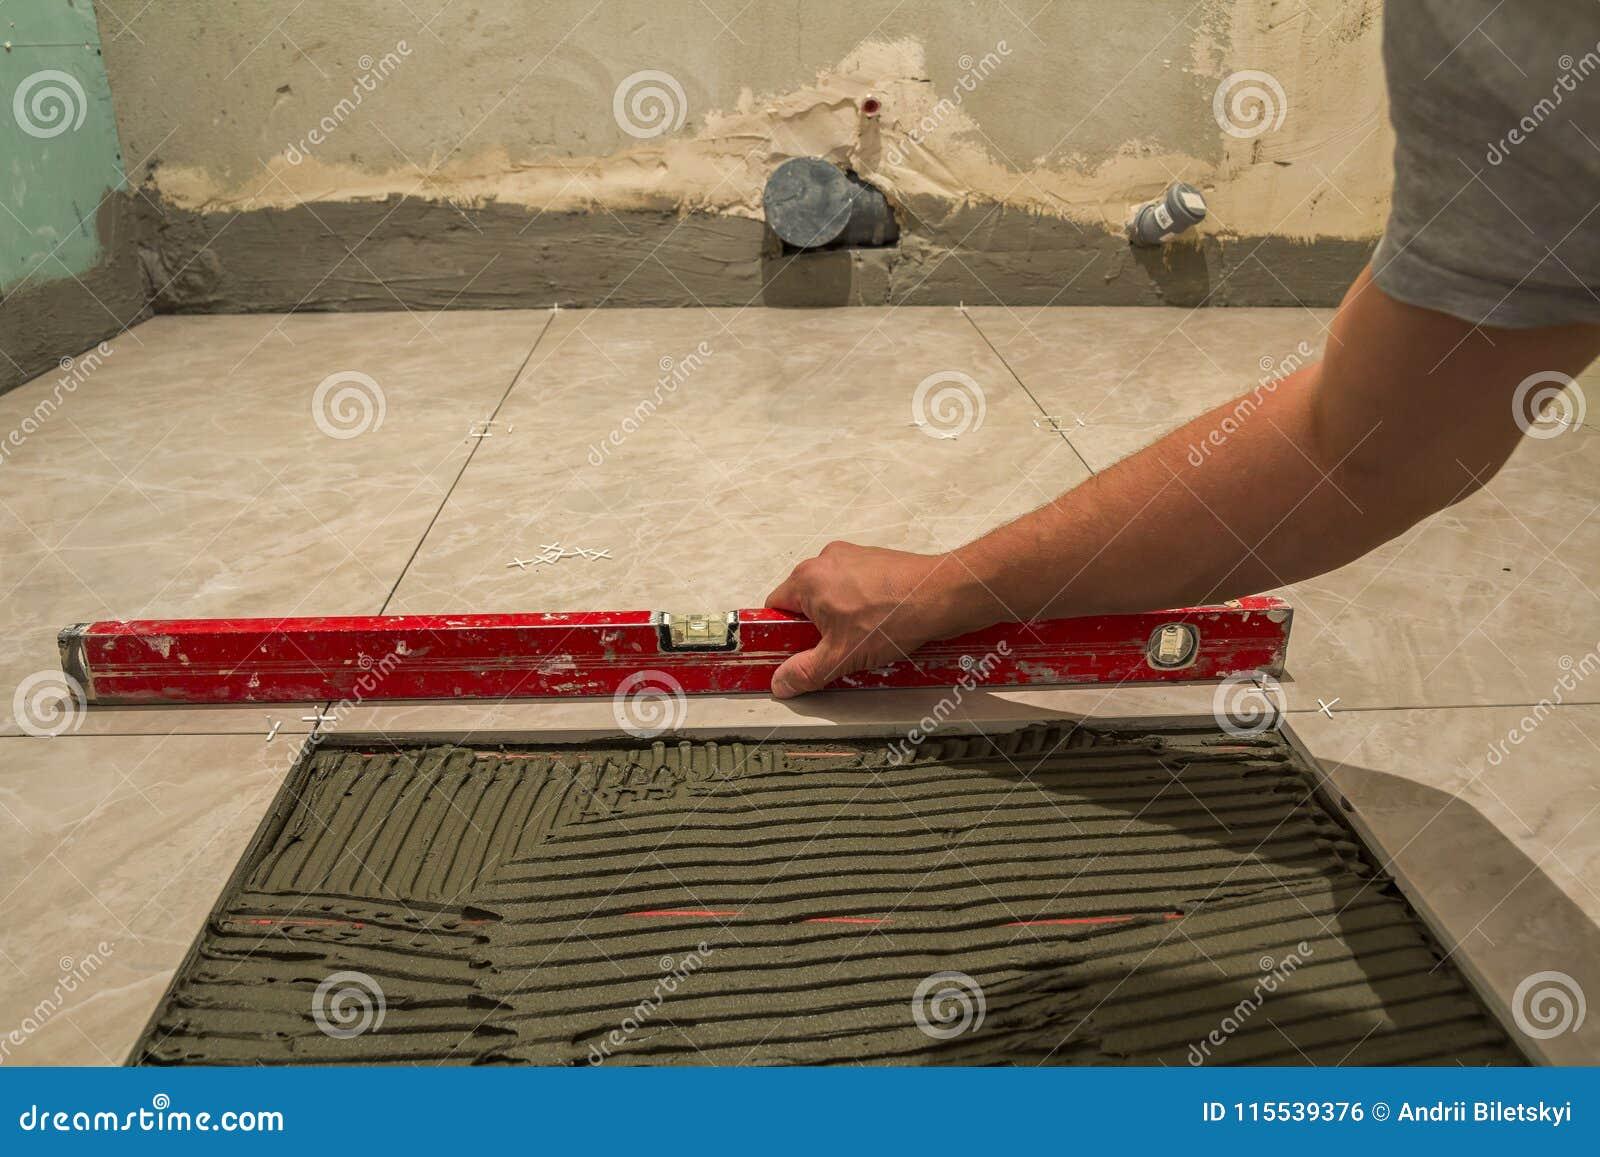 Ceramic Tiles And Tools For Tiler Worker Hand Installing Floor